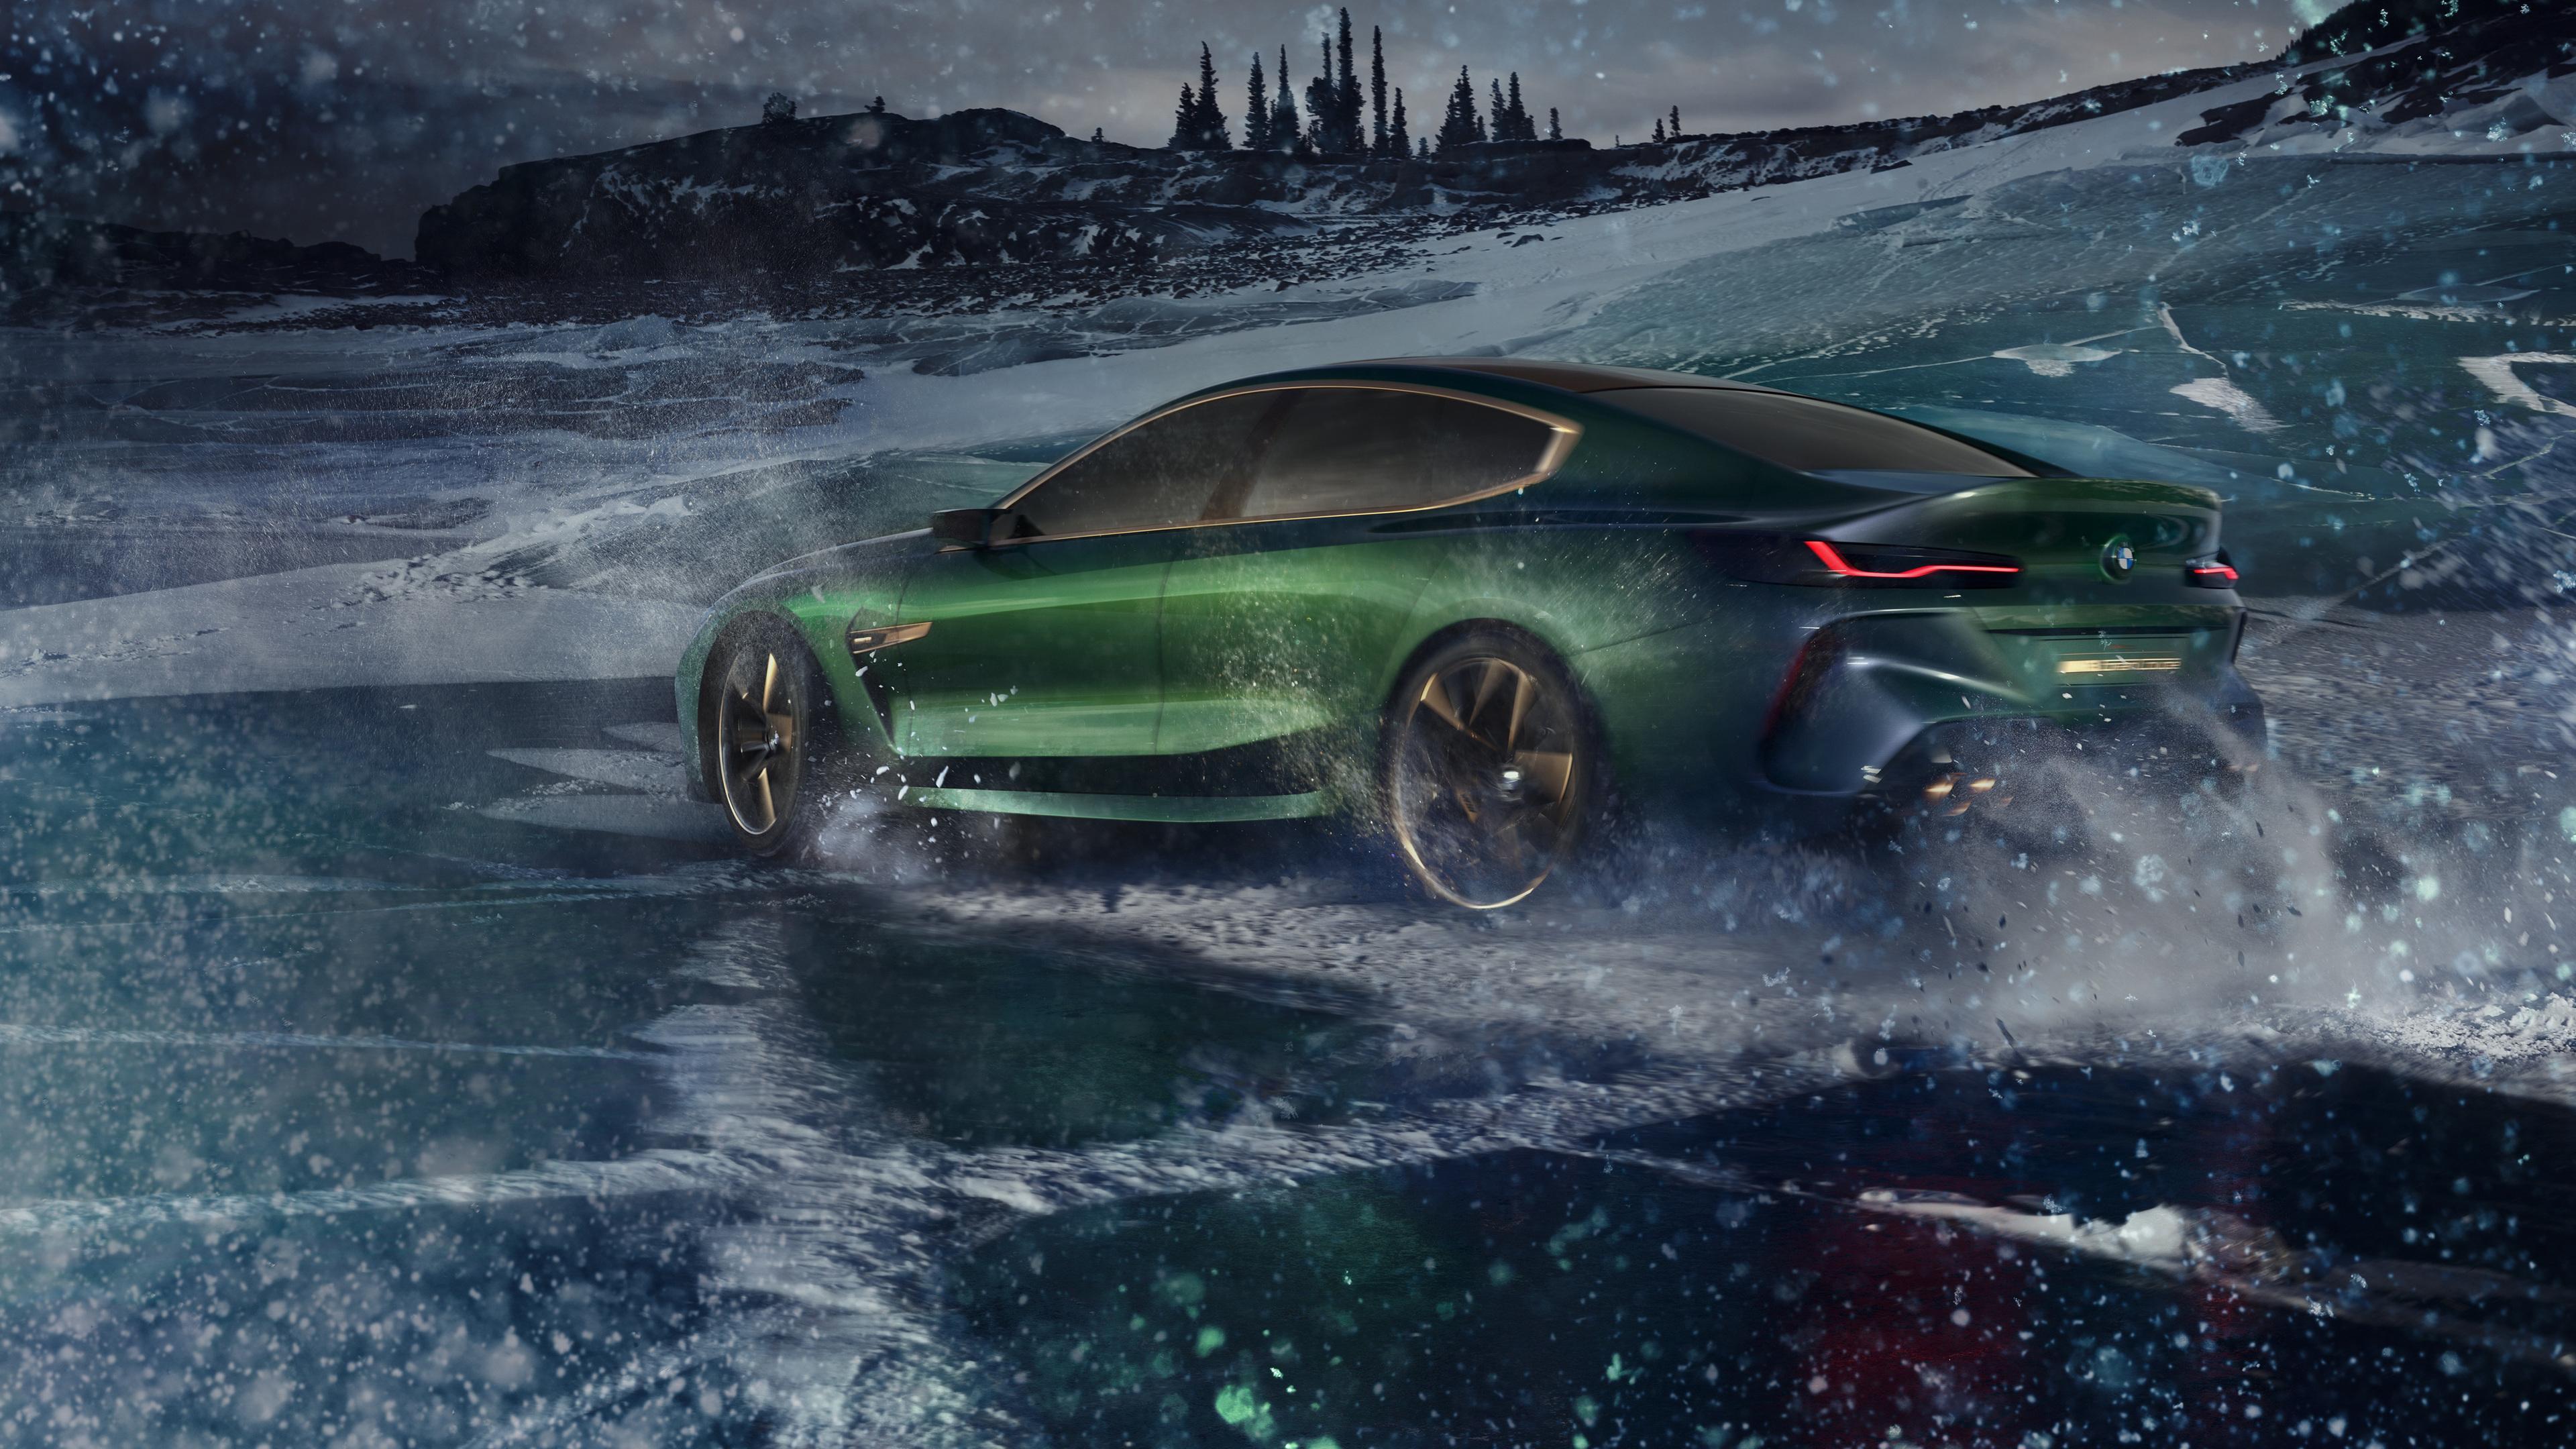 bmw concept m8 gran coupe 4k 1539110149 - Bmw Concept M8 Gran Coupe 4k - hd-wallpapers, concept cars wallpapers, cars wallpapers, bmw wallpapers, bmw concept m8 gran coupe wallpapers, 4k-wallpapers, 2018 cars wallpapers